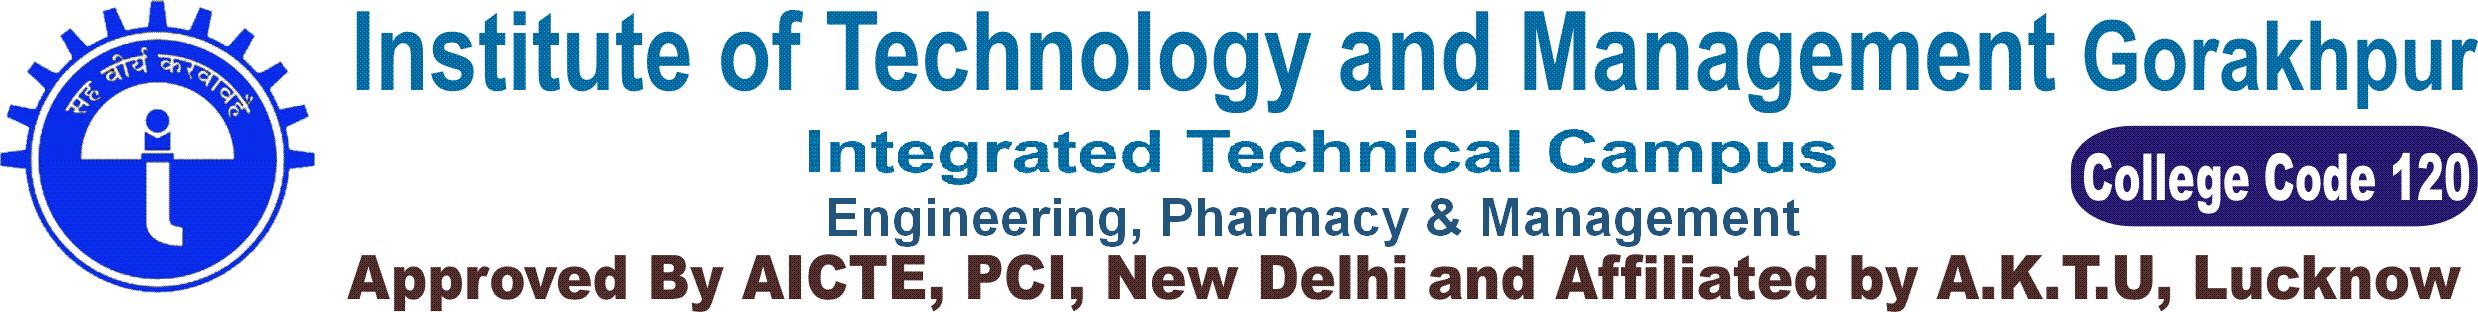 26 Professor, Associate Professor, Assistant Professor Post Vacancy - Institute of Technology and Management